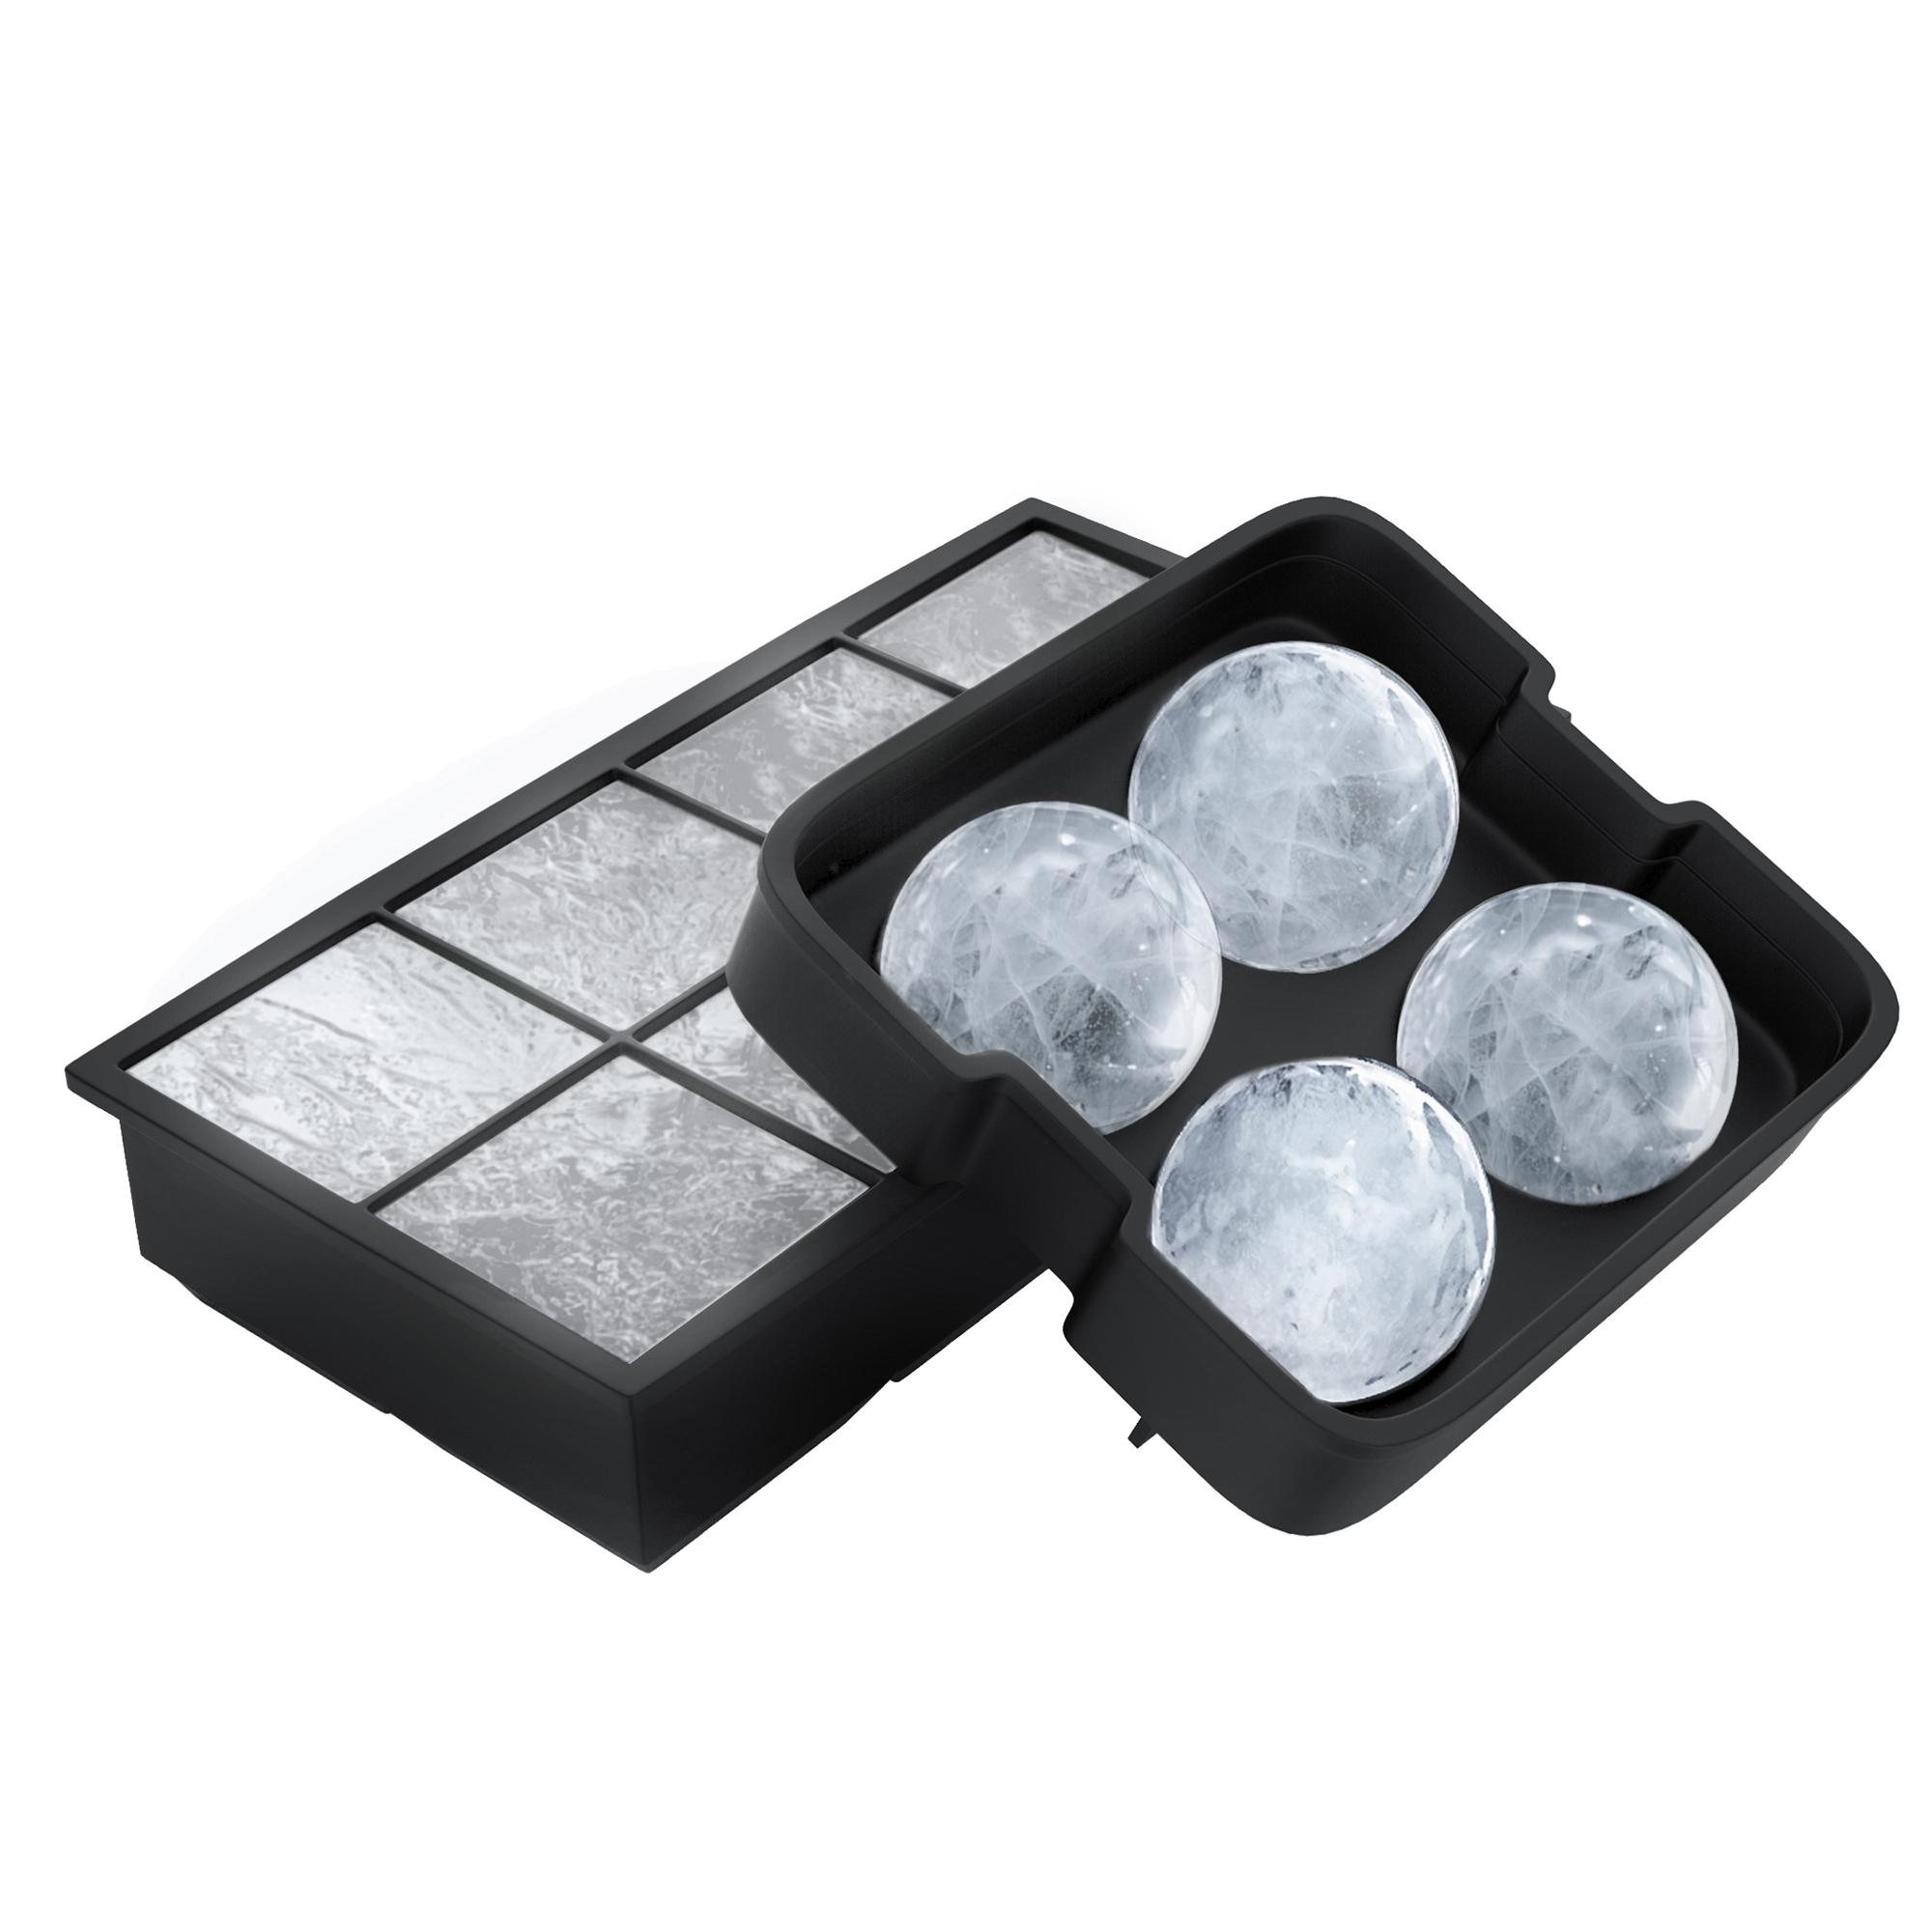 Silicone Ice Cube Trays Melting Ice Balls Frozen Deserts Square Round Molds 59f762360bda71221b165d2f